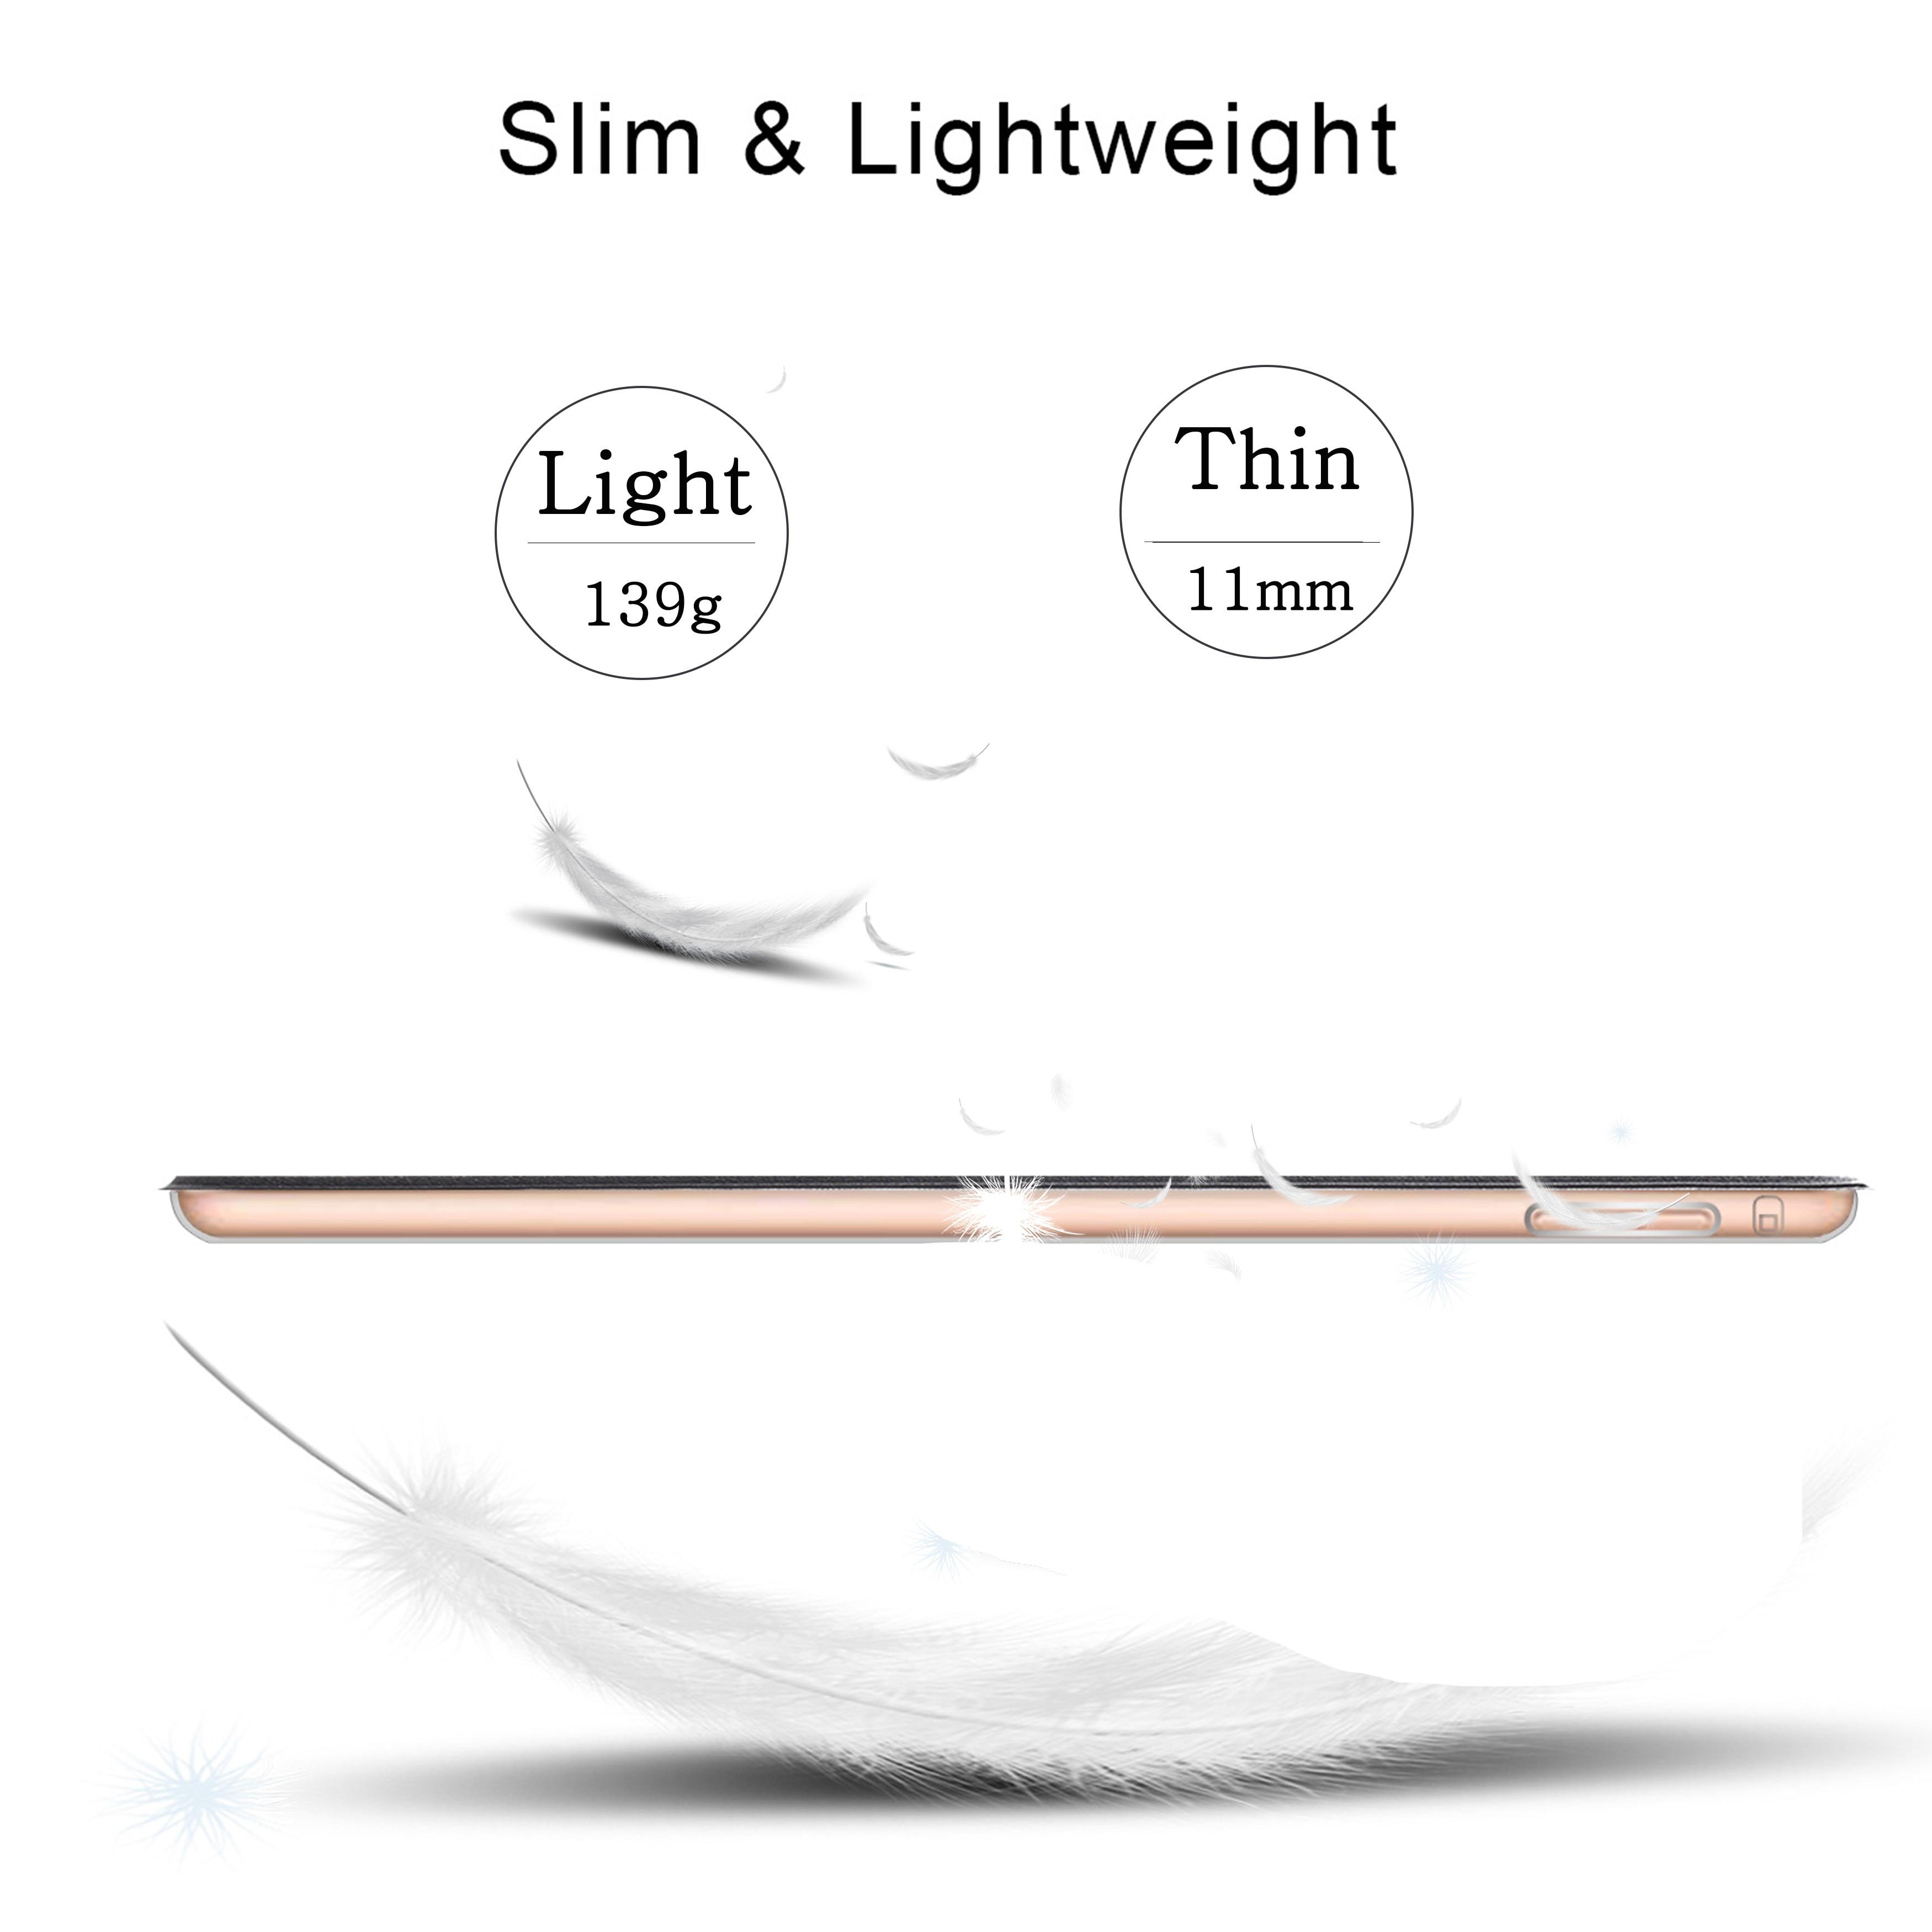 Capa de celular para ipad, para modelos ipad 2 3 4, a1395 a1430 a1458 capa para acordar para ipad 4 2 3 5